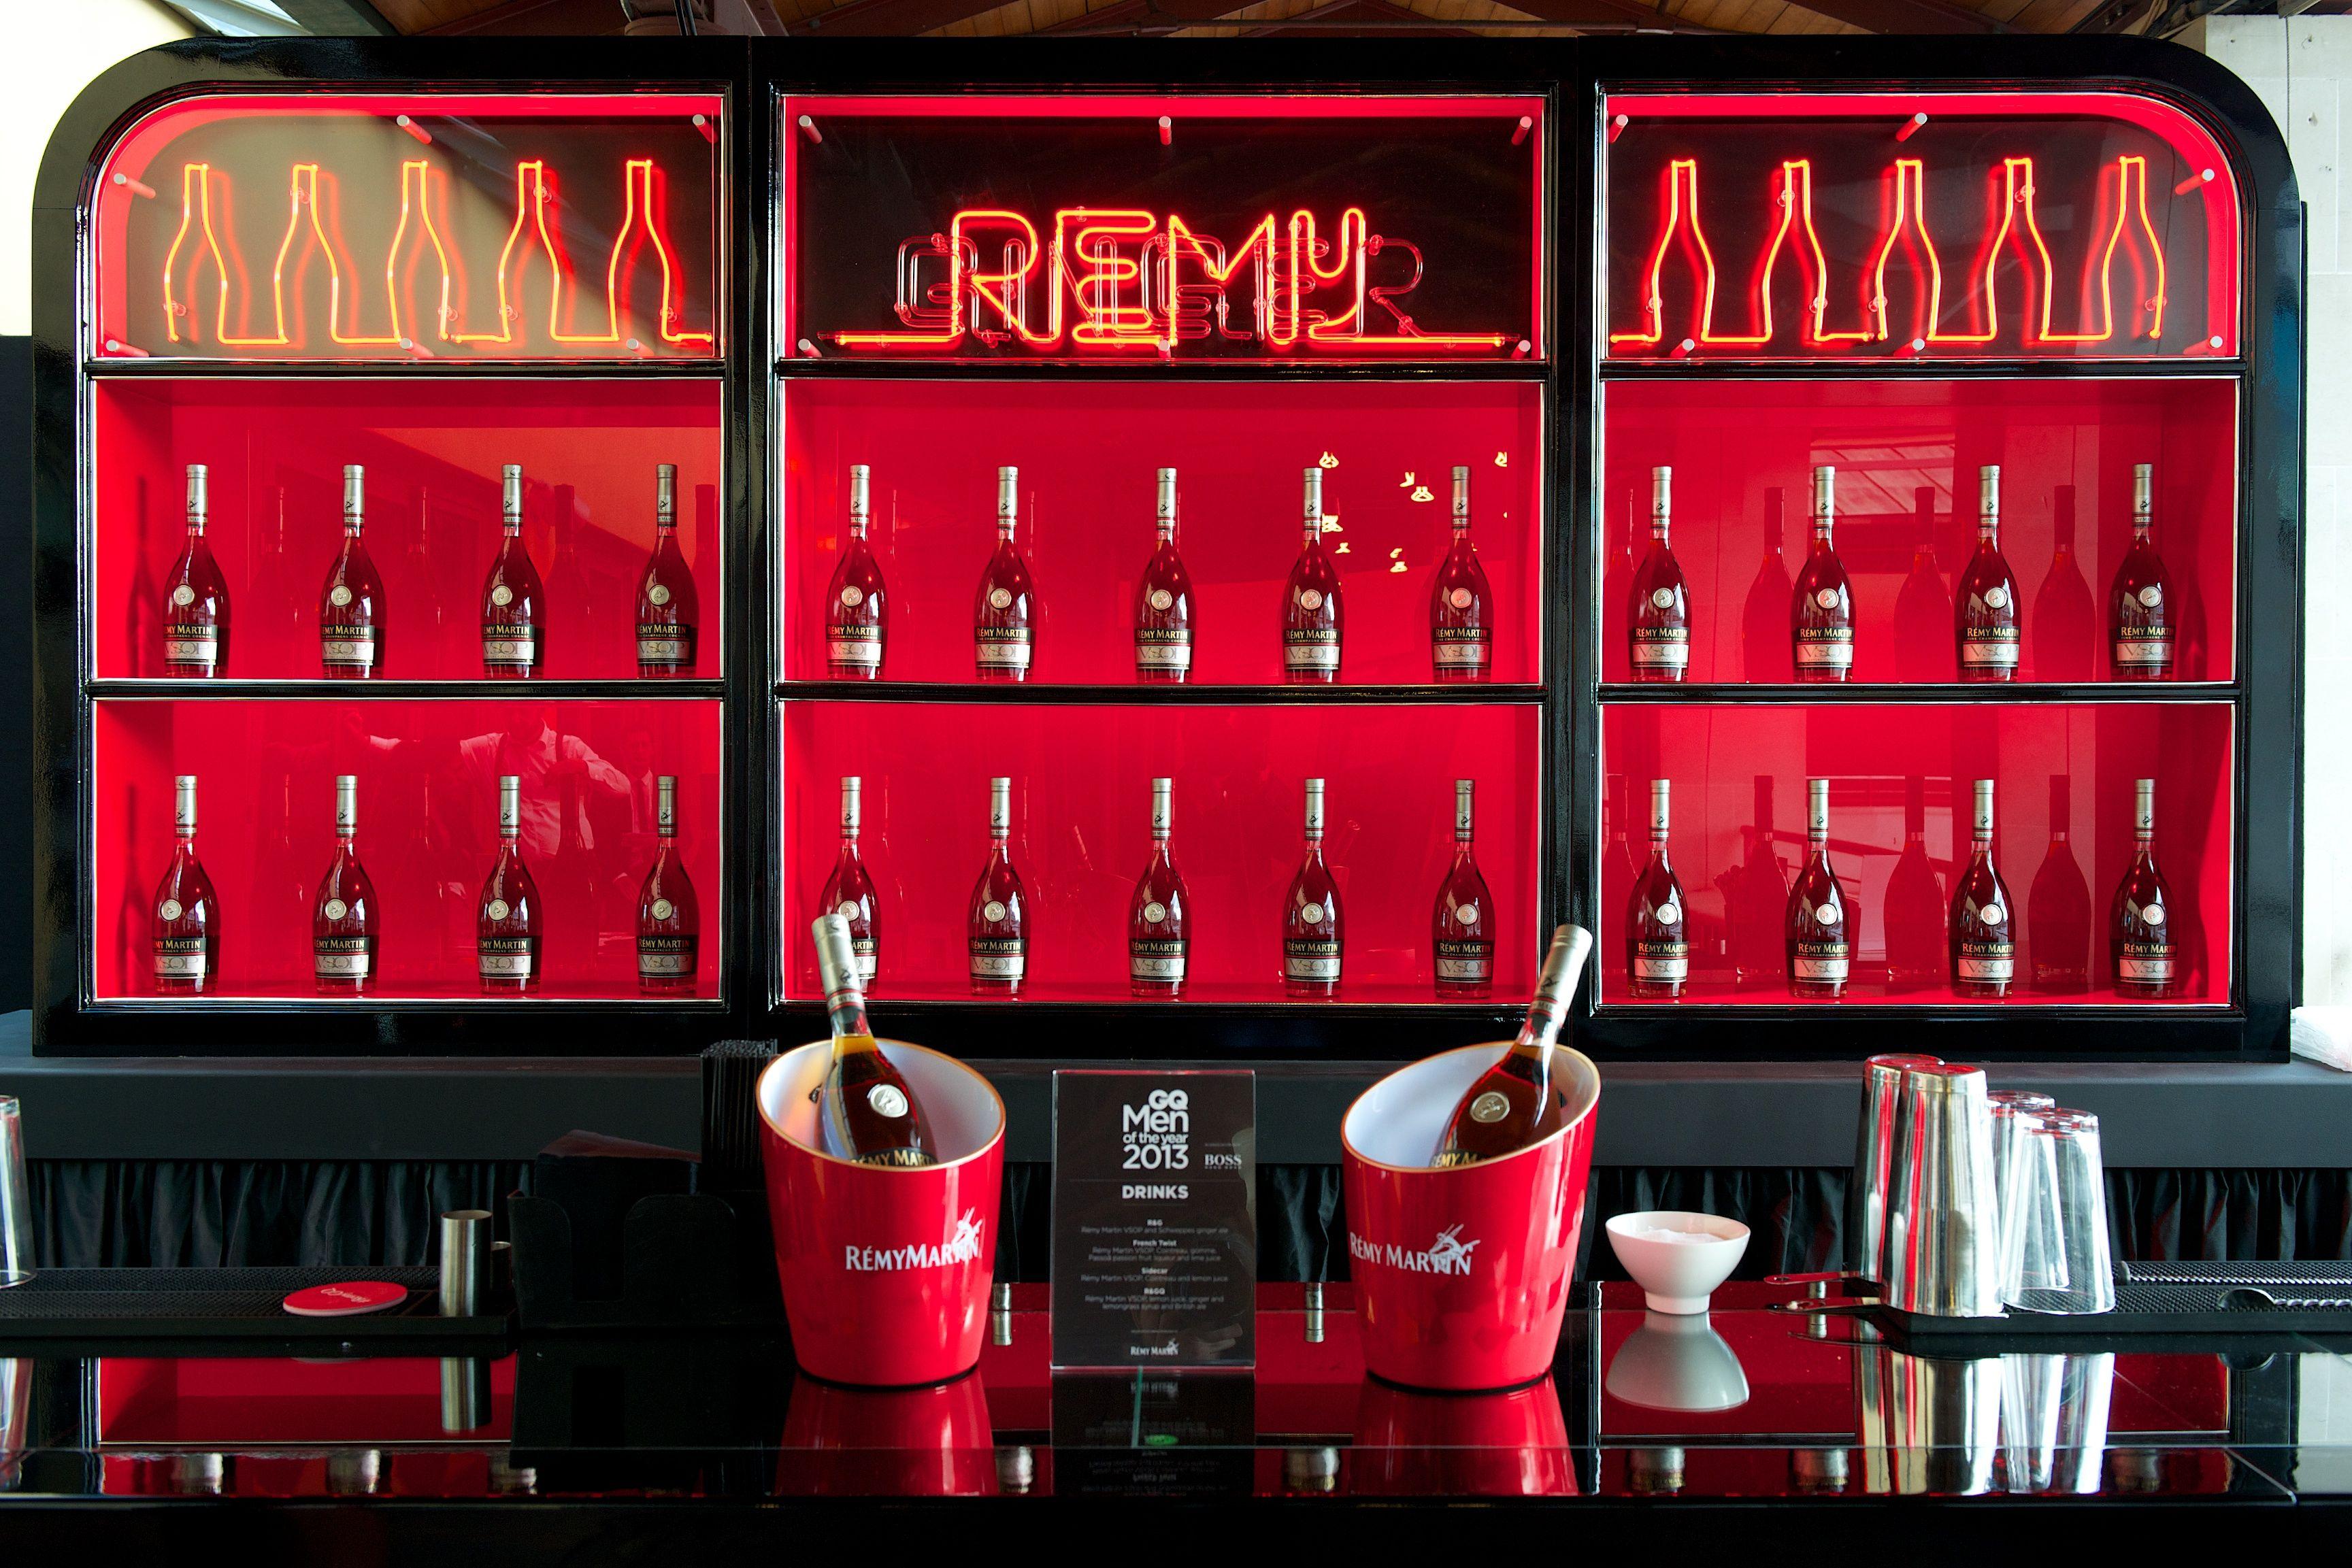 Remy Back Bar Design And Styling By The Honest Group The Gq Awards 2013 Bar Design Restaurant Back Bar Design Bar Displays